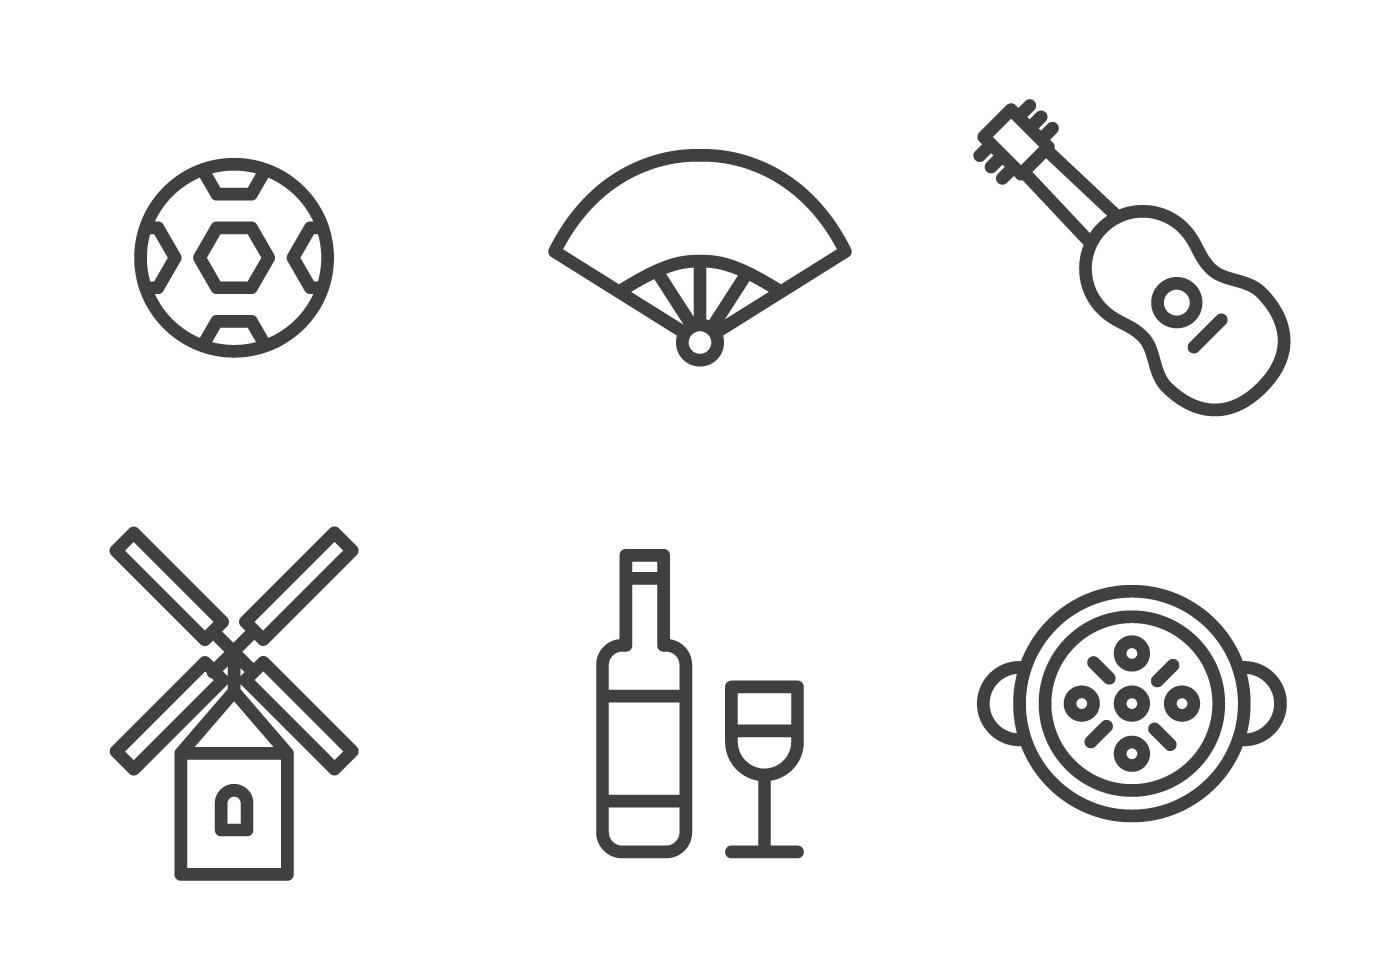 spanish icon set download free vector art stock